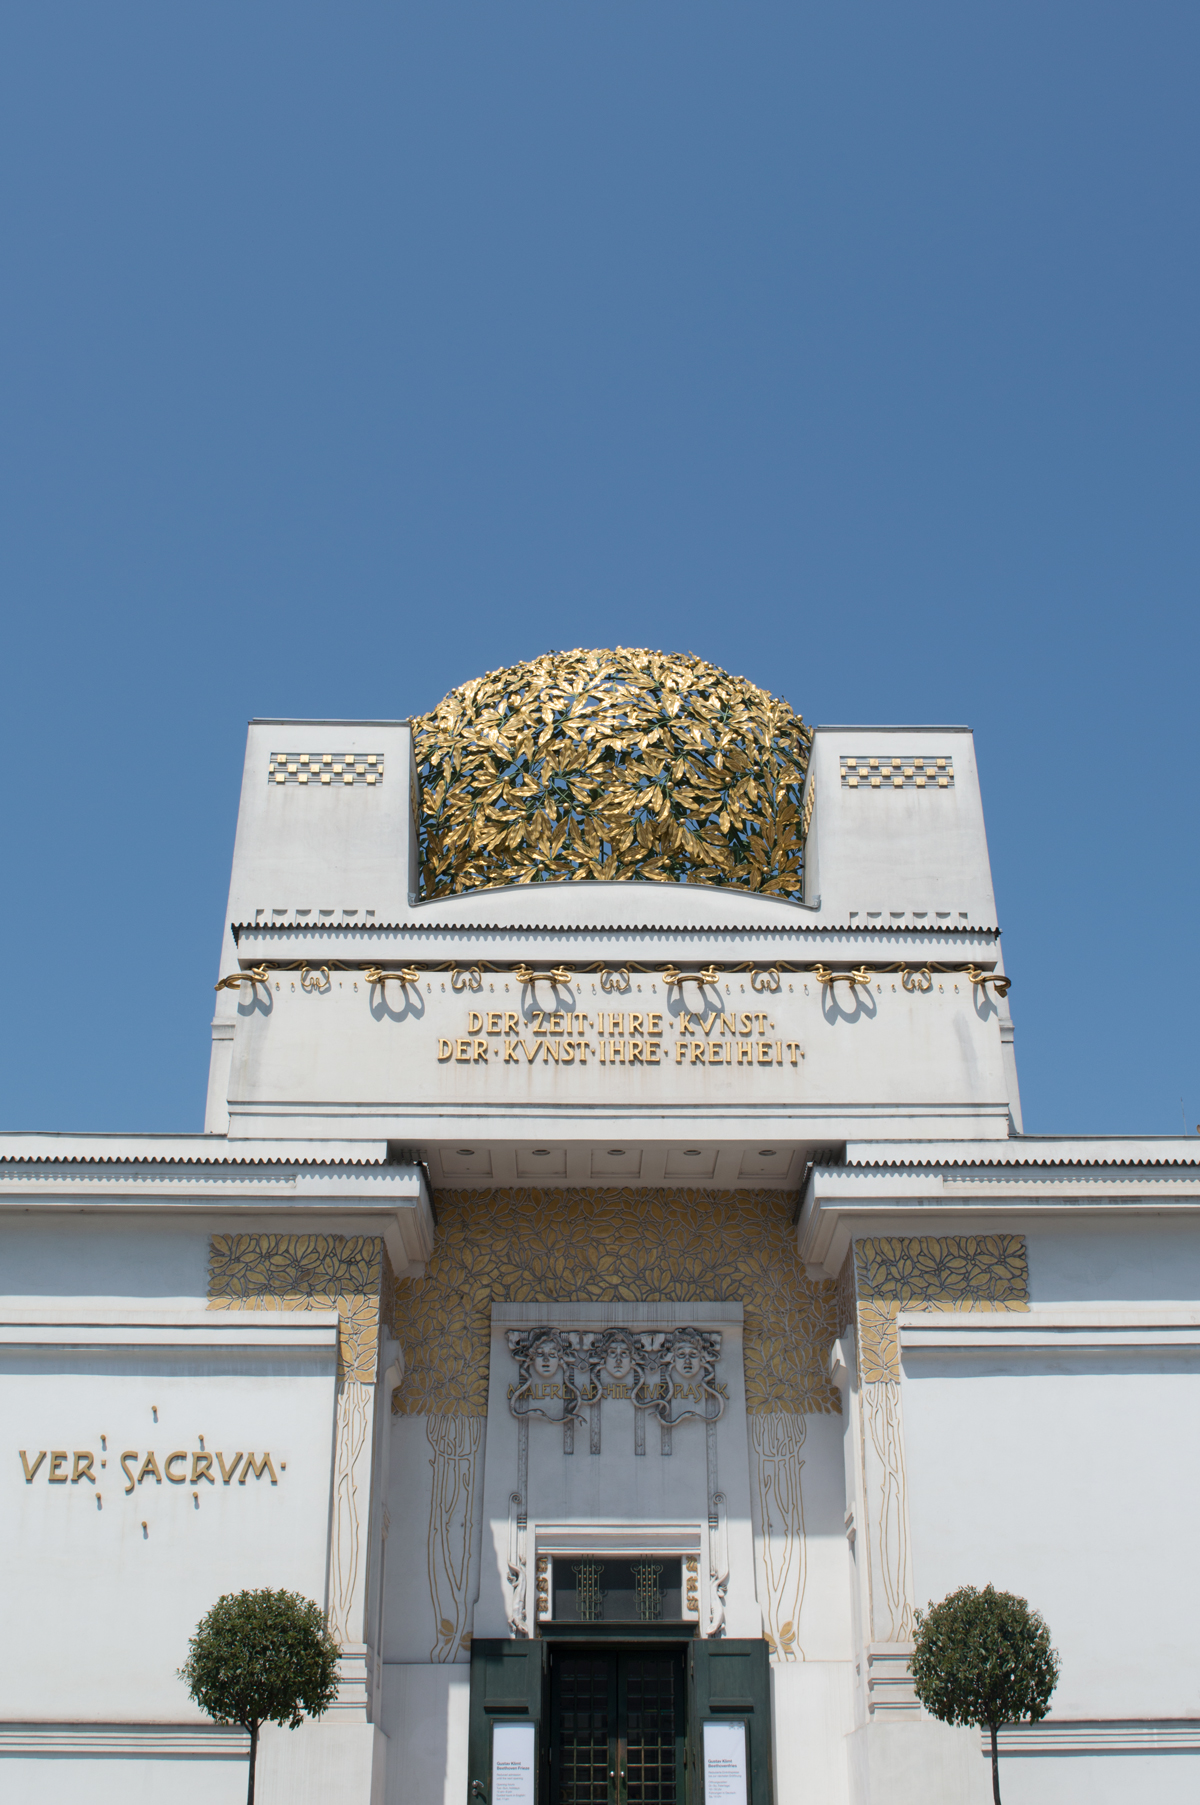 Art Nouveau, decorative arts, Gustav Klimt, Josef Hoffman, Koloman Moser, Joseph Olbrich, Vienna, Austria, architecture, gold, city, landmark, Europe